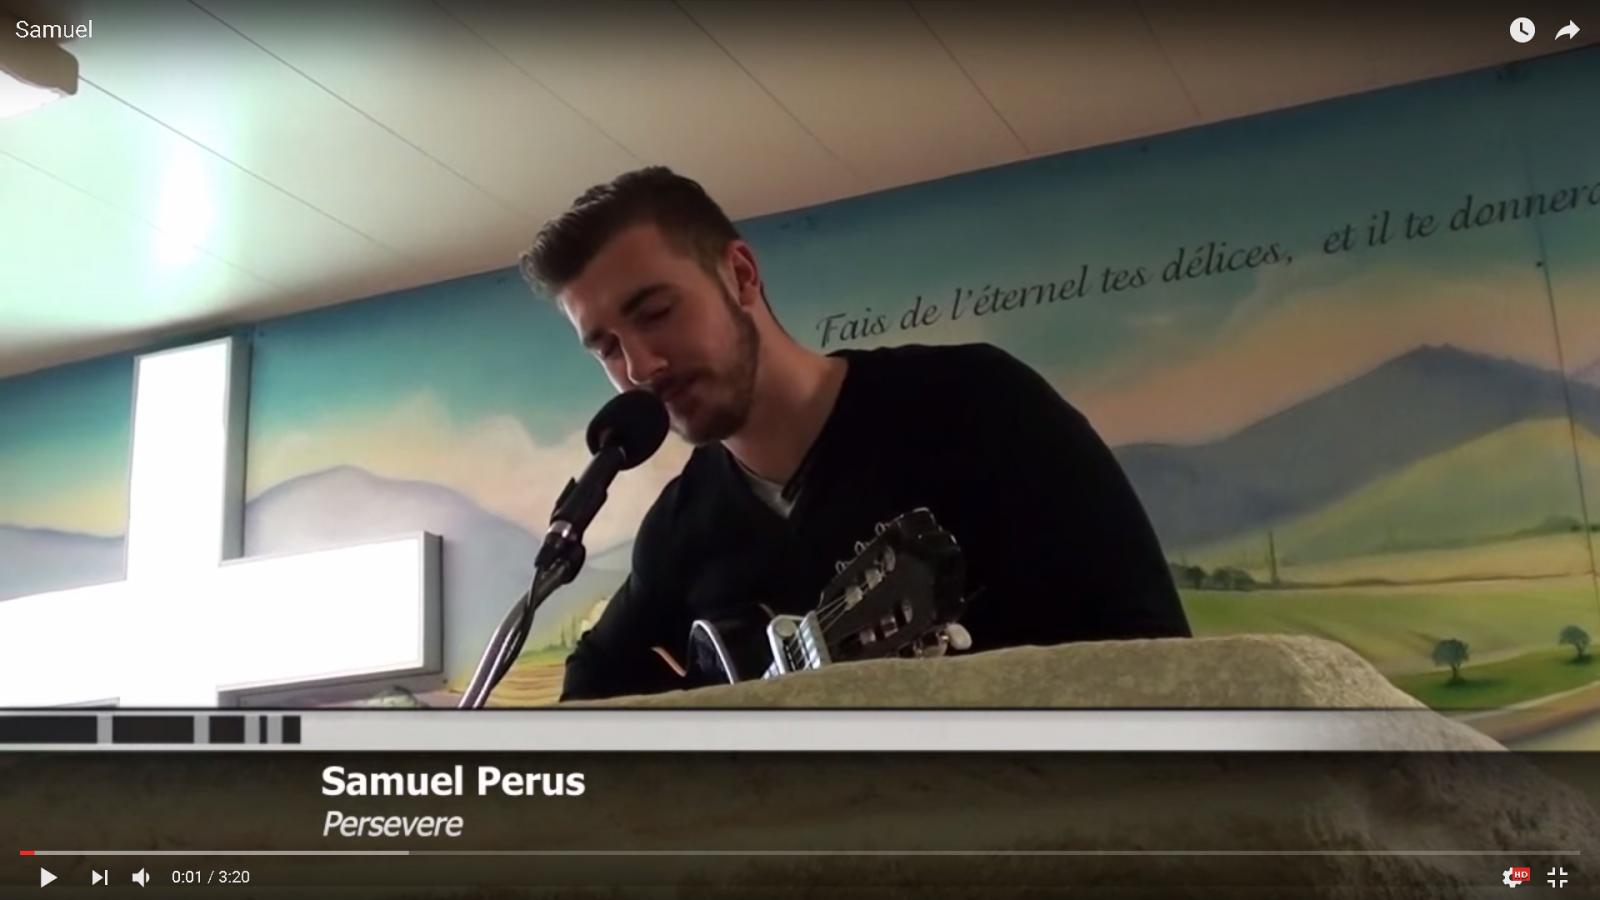 Samuel - Persevere